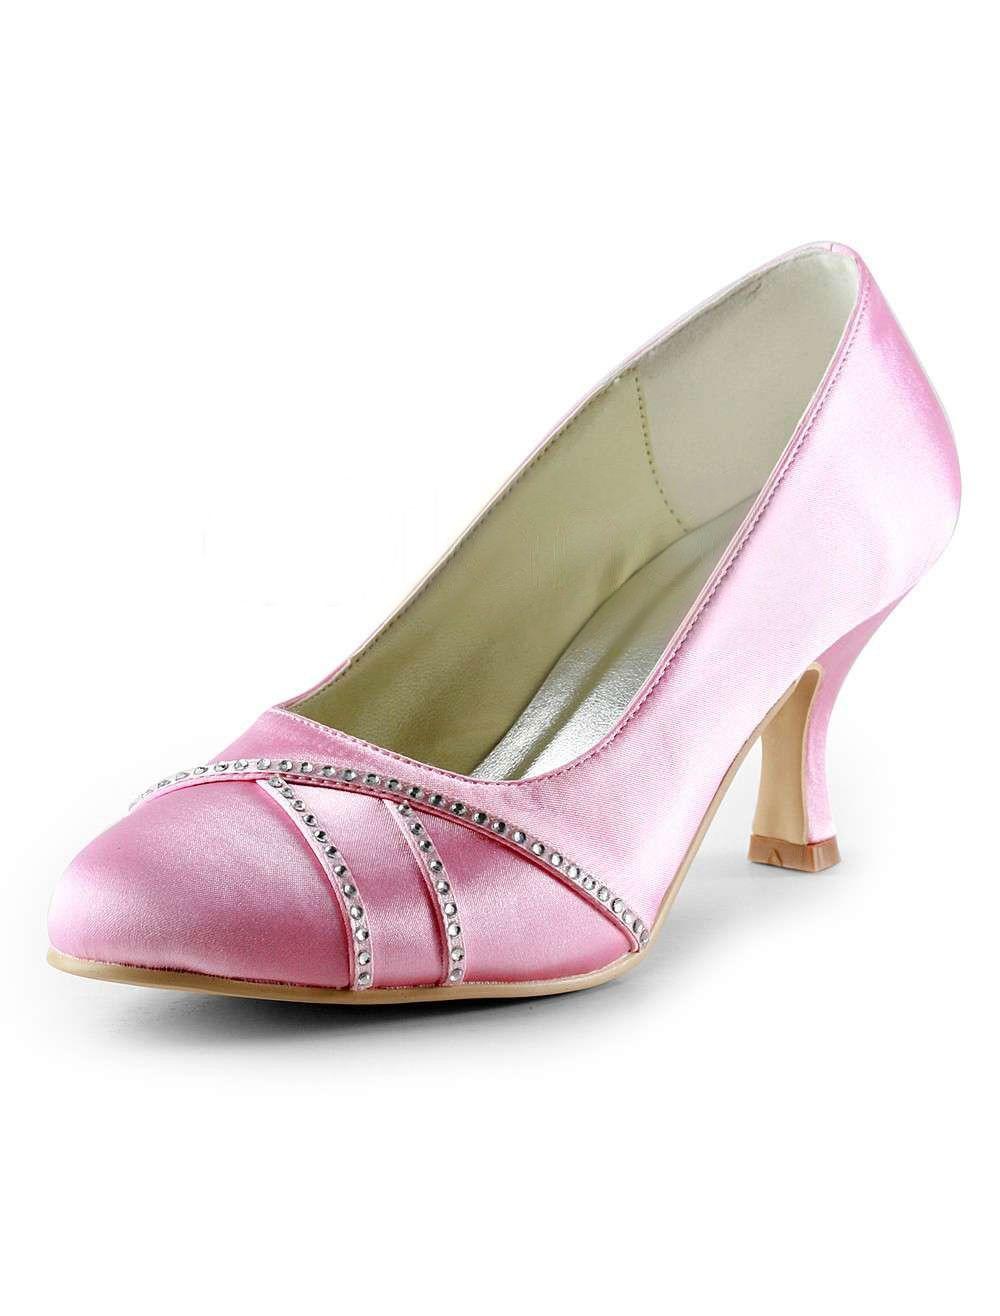 23++ Rhinestone wedding shoes pink ideas